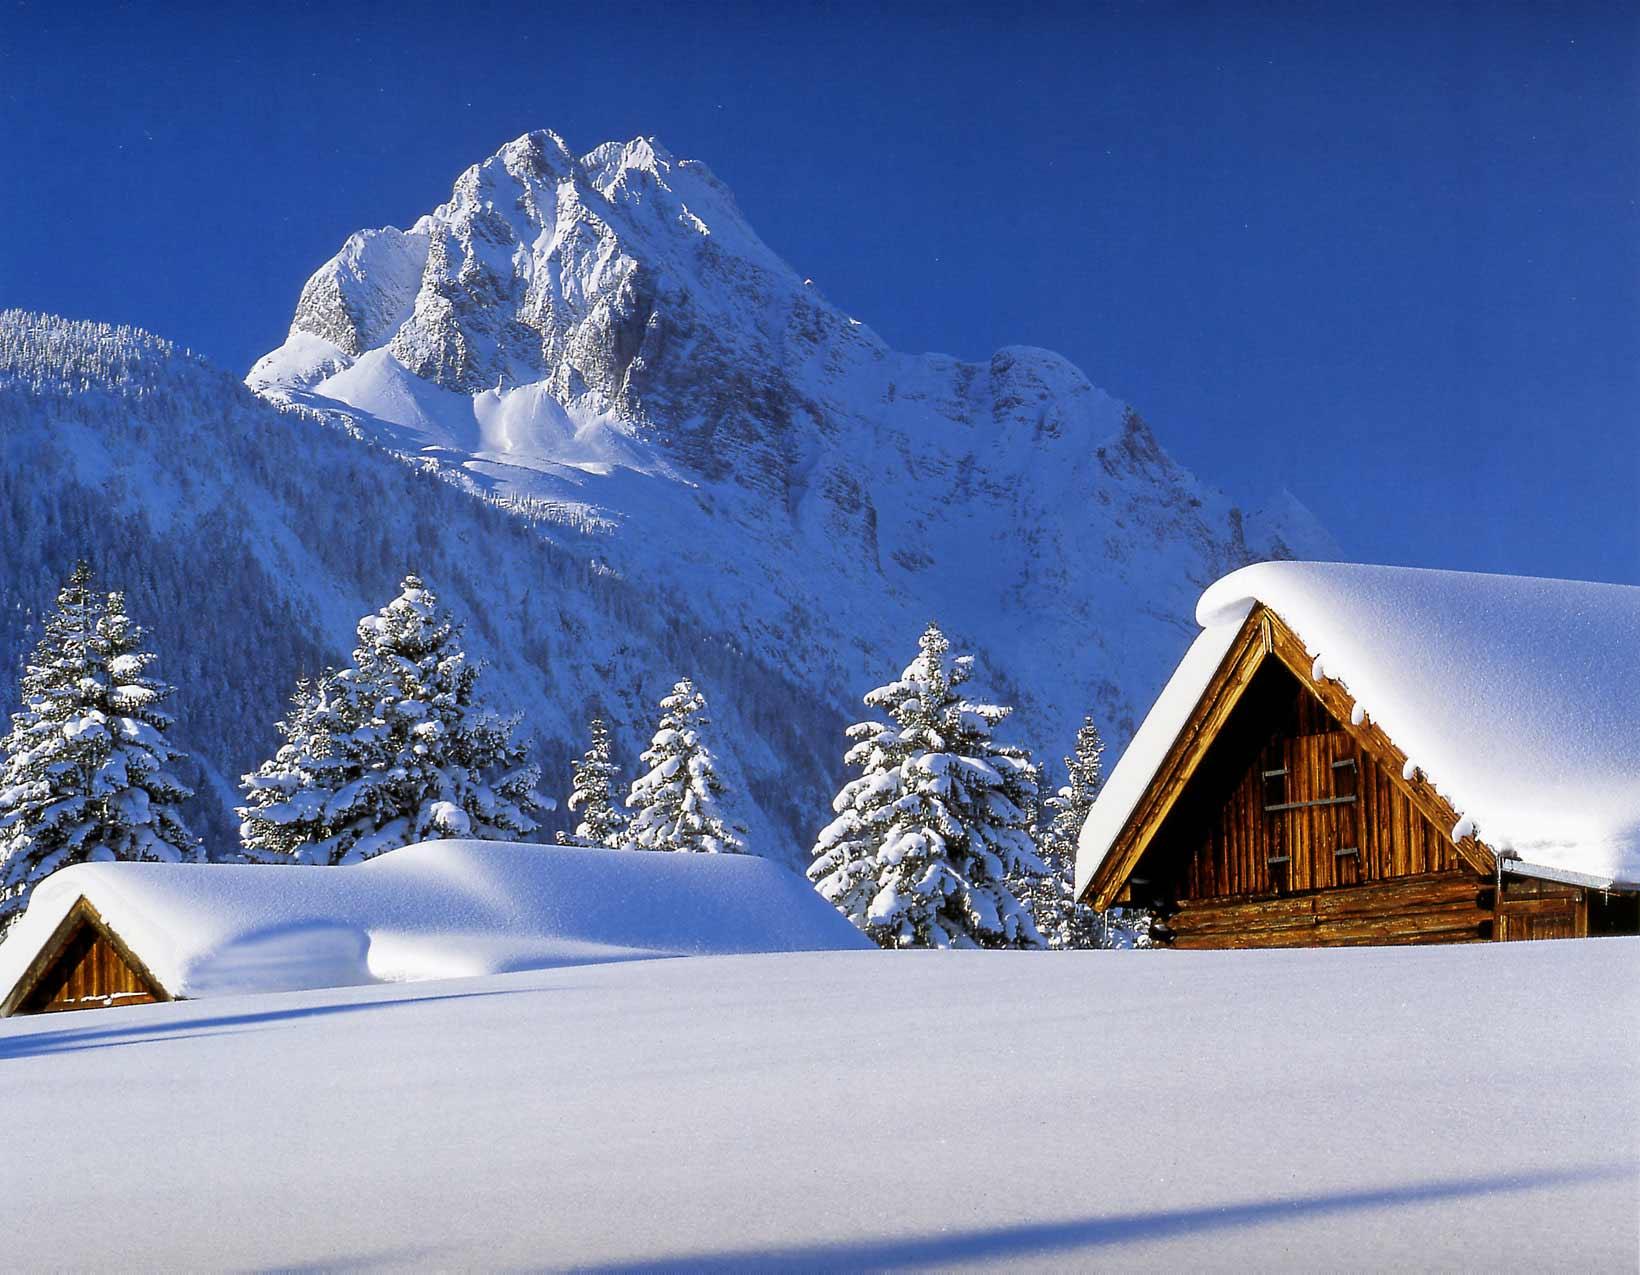 snow wallpaper desktop 2015   Grasscloth Wallpaper 1640x1275